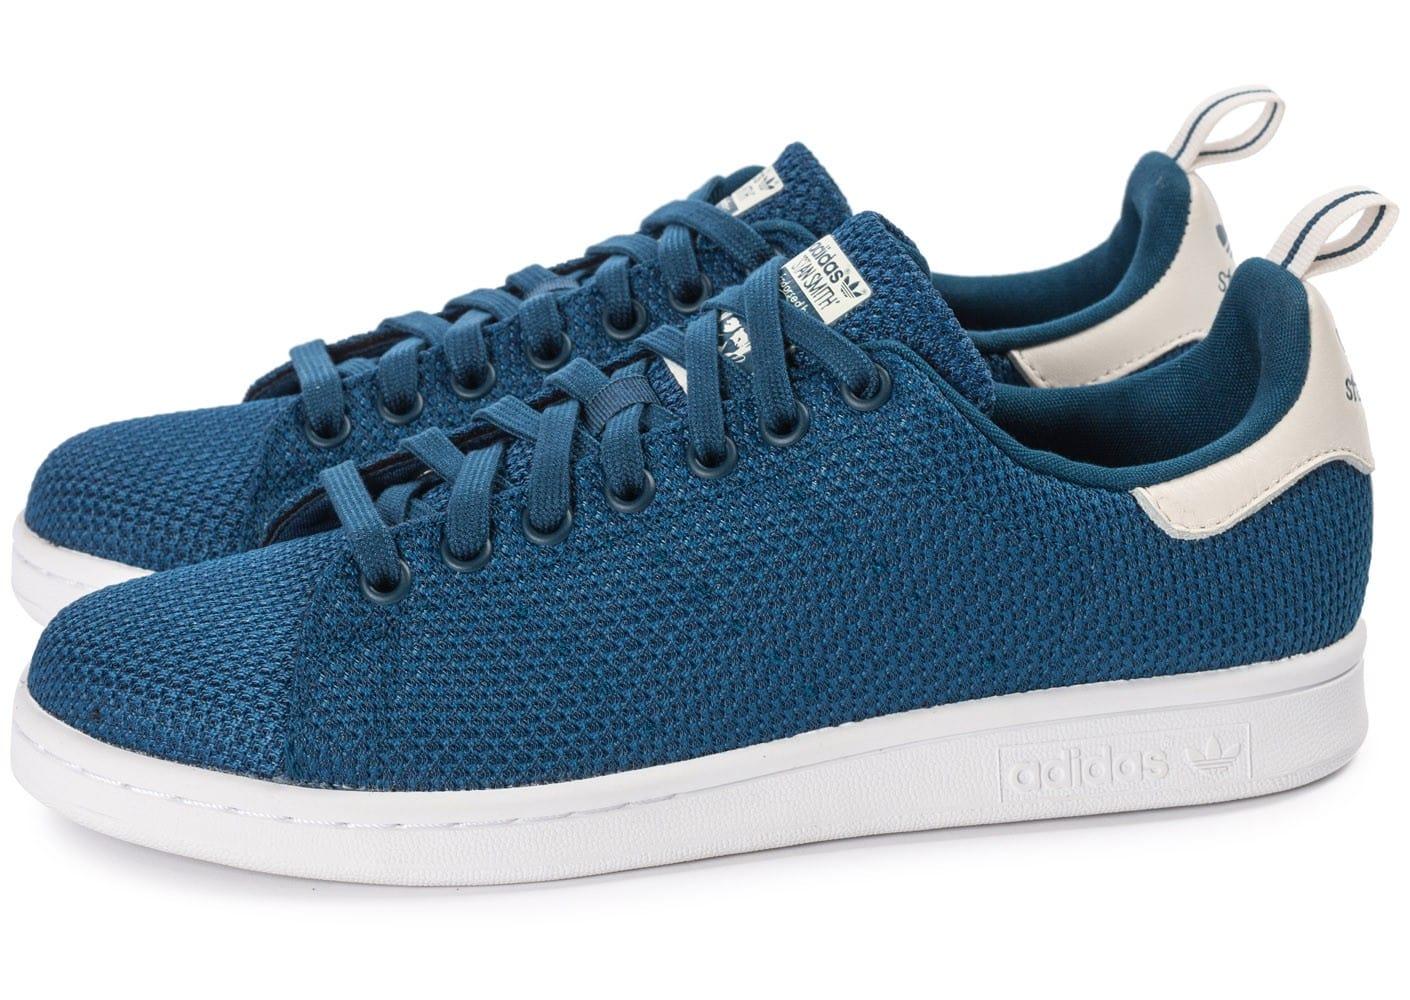 basket stan smith homme bleu Off 56% - www.bashhguidelines.org